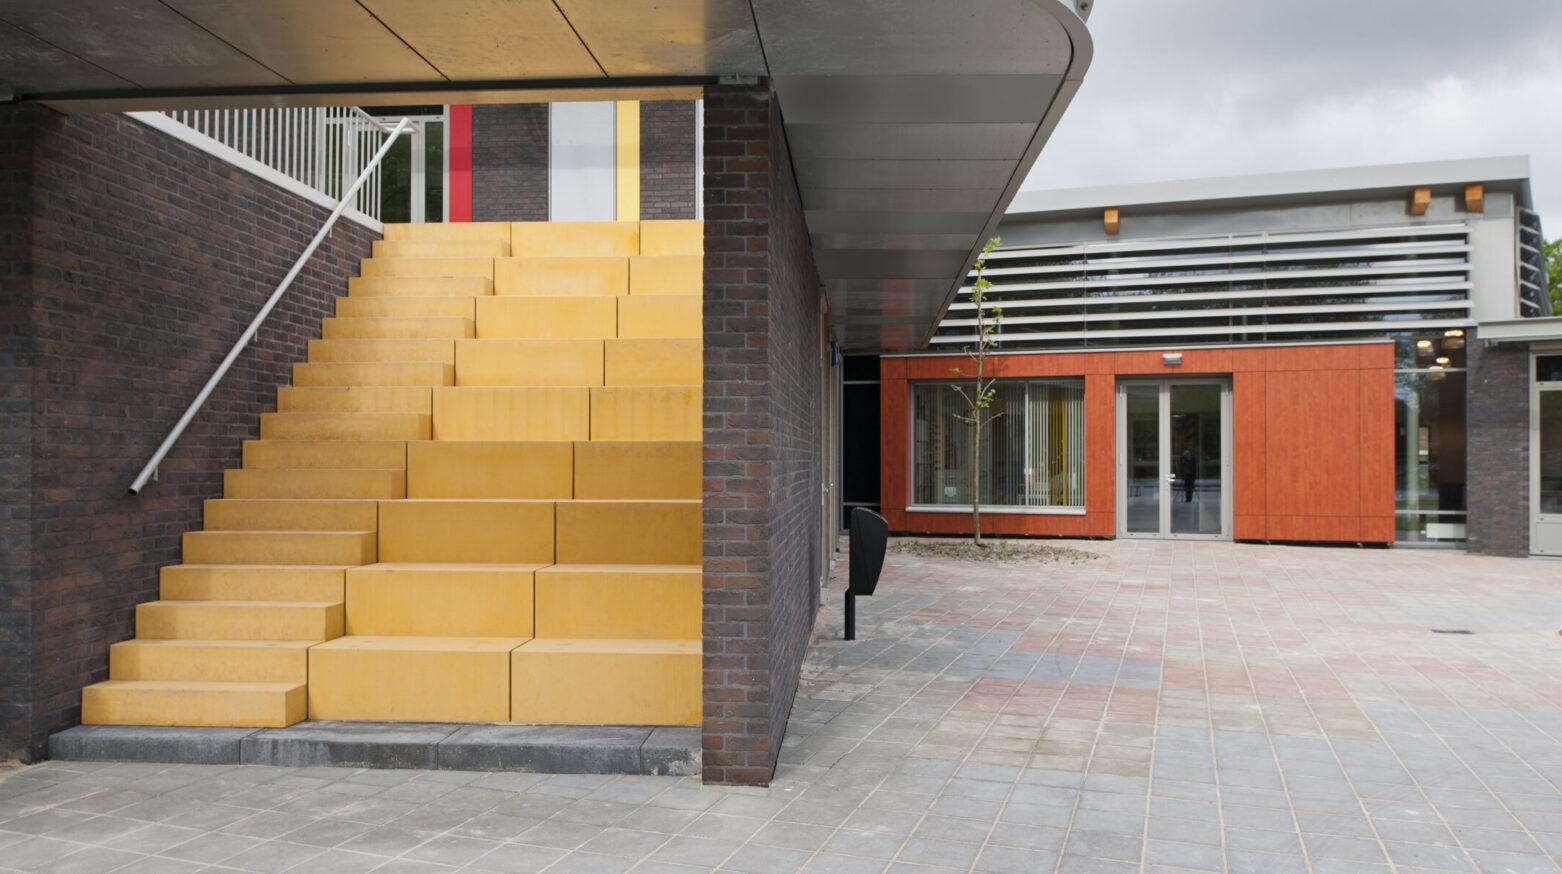 Kindcentrum oirschot trap2